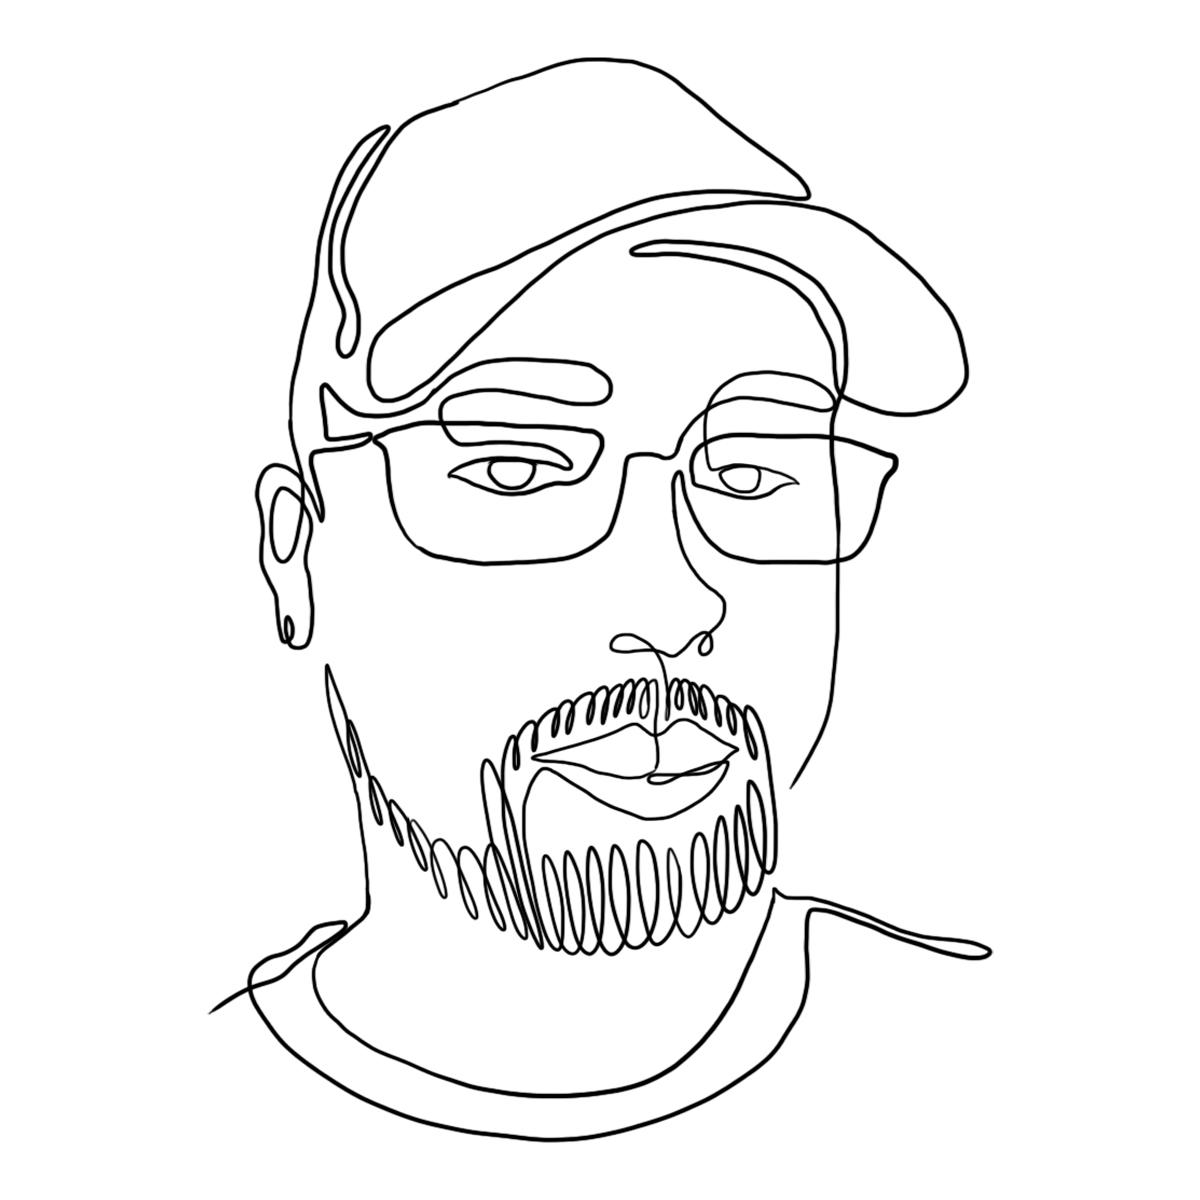 https://conceptum.com.gt/wp-content/uploads/2021/04/Erick.jpg